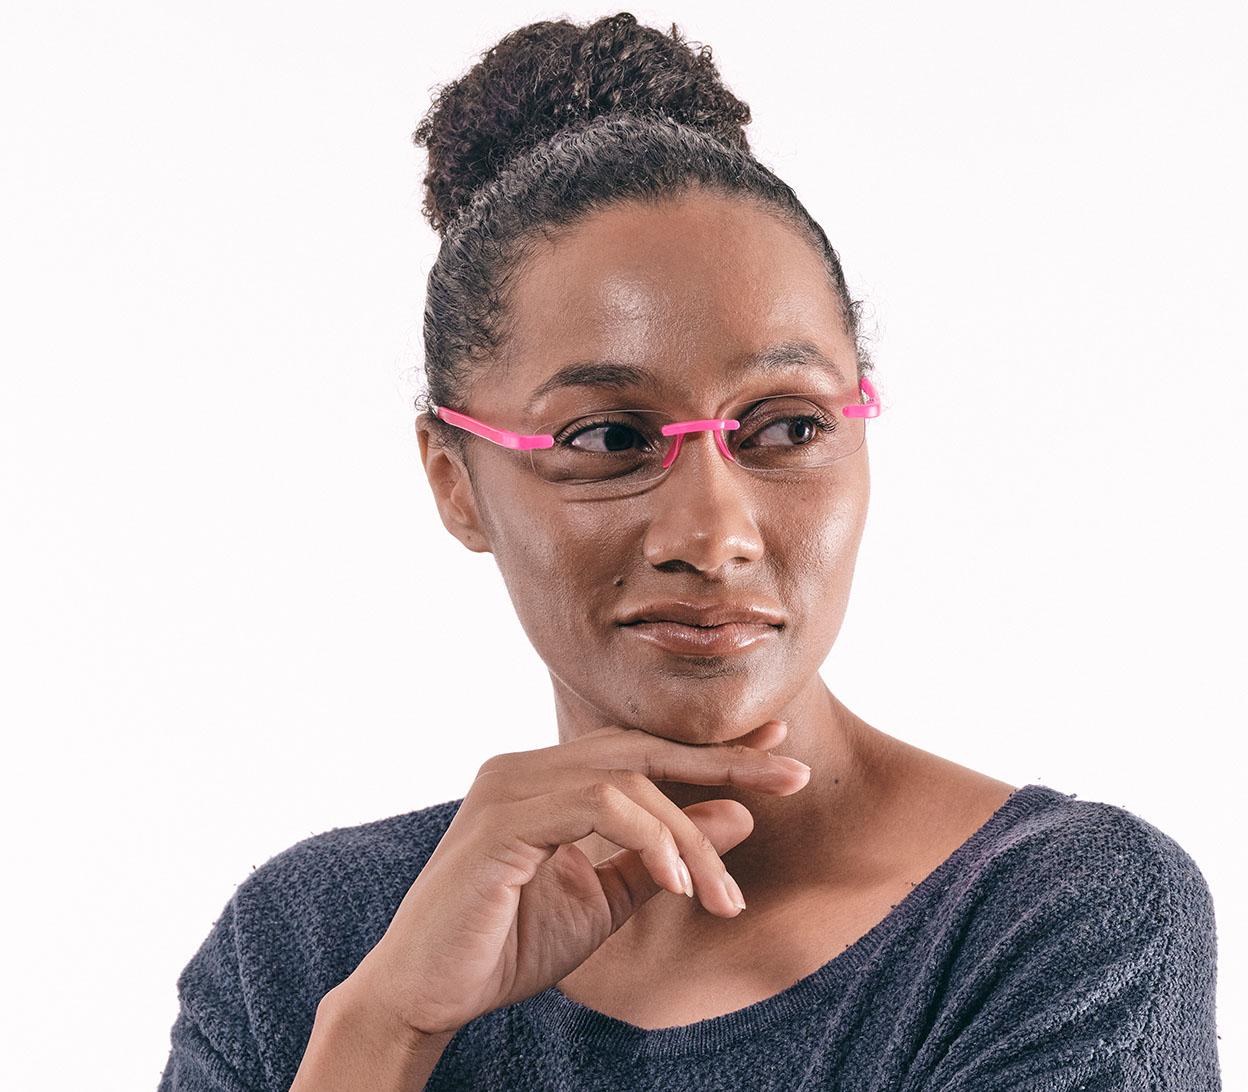 Model Image 1 - Jelli Neon (Pink)